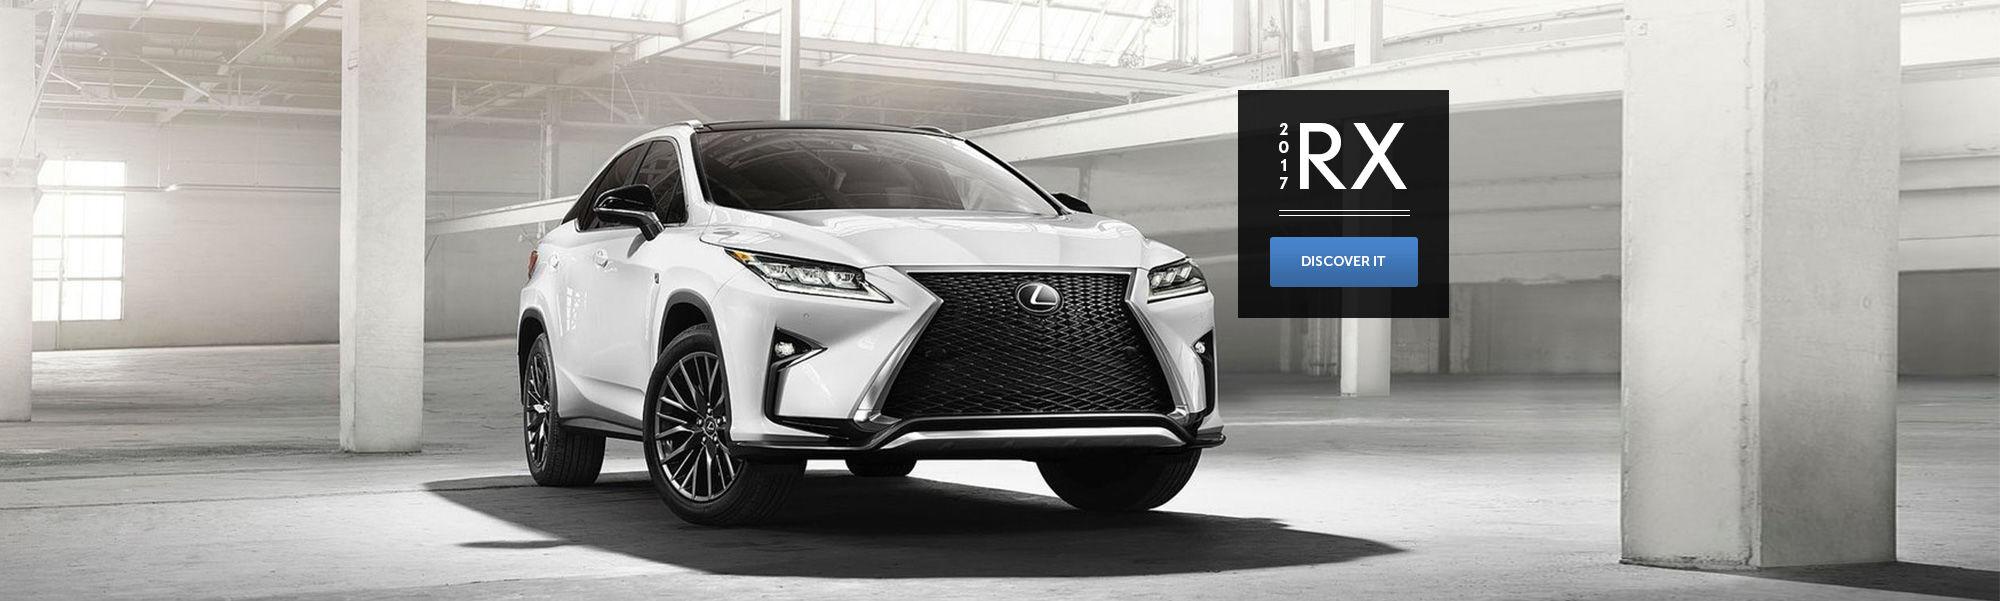 Lexus 2017 RX